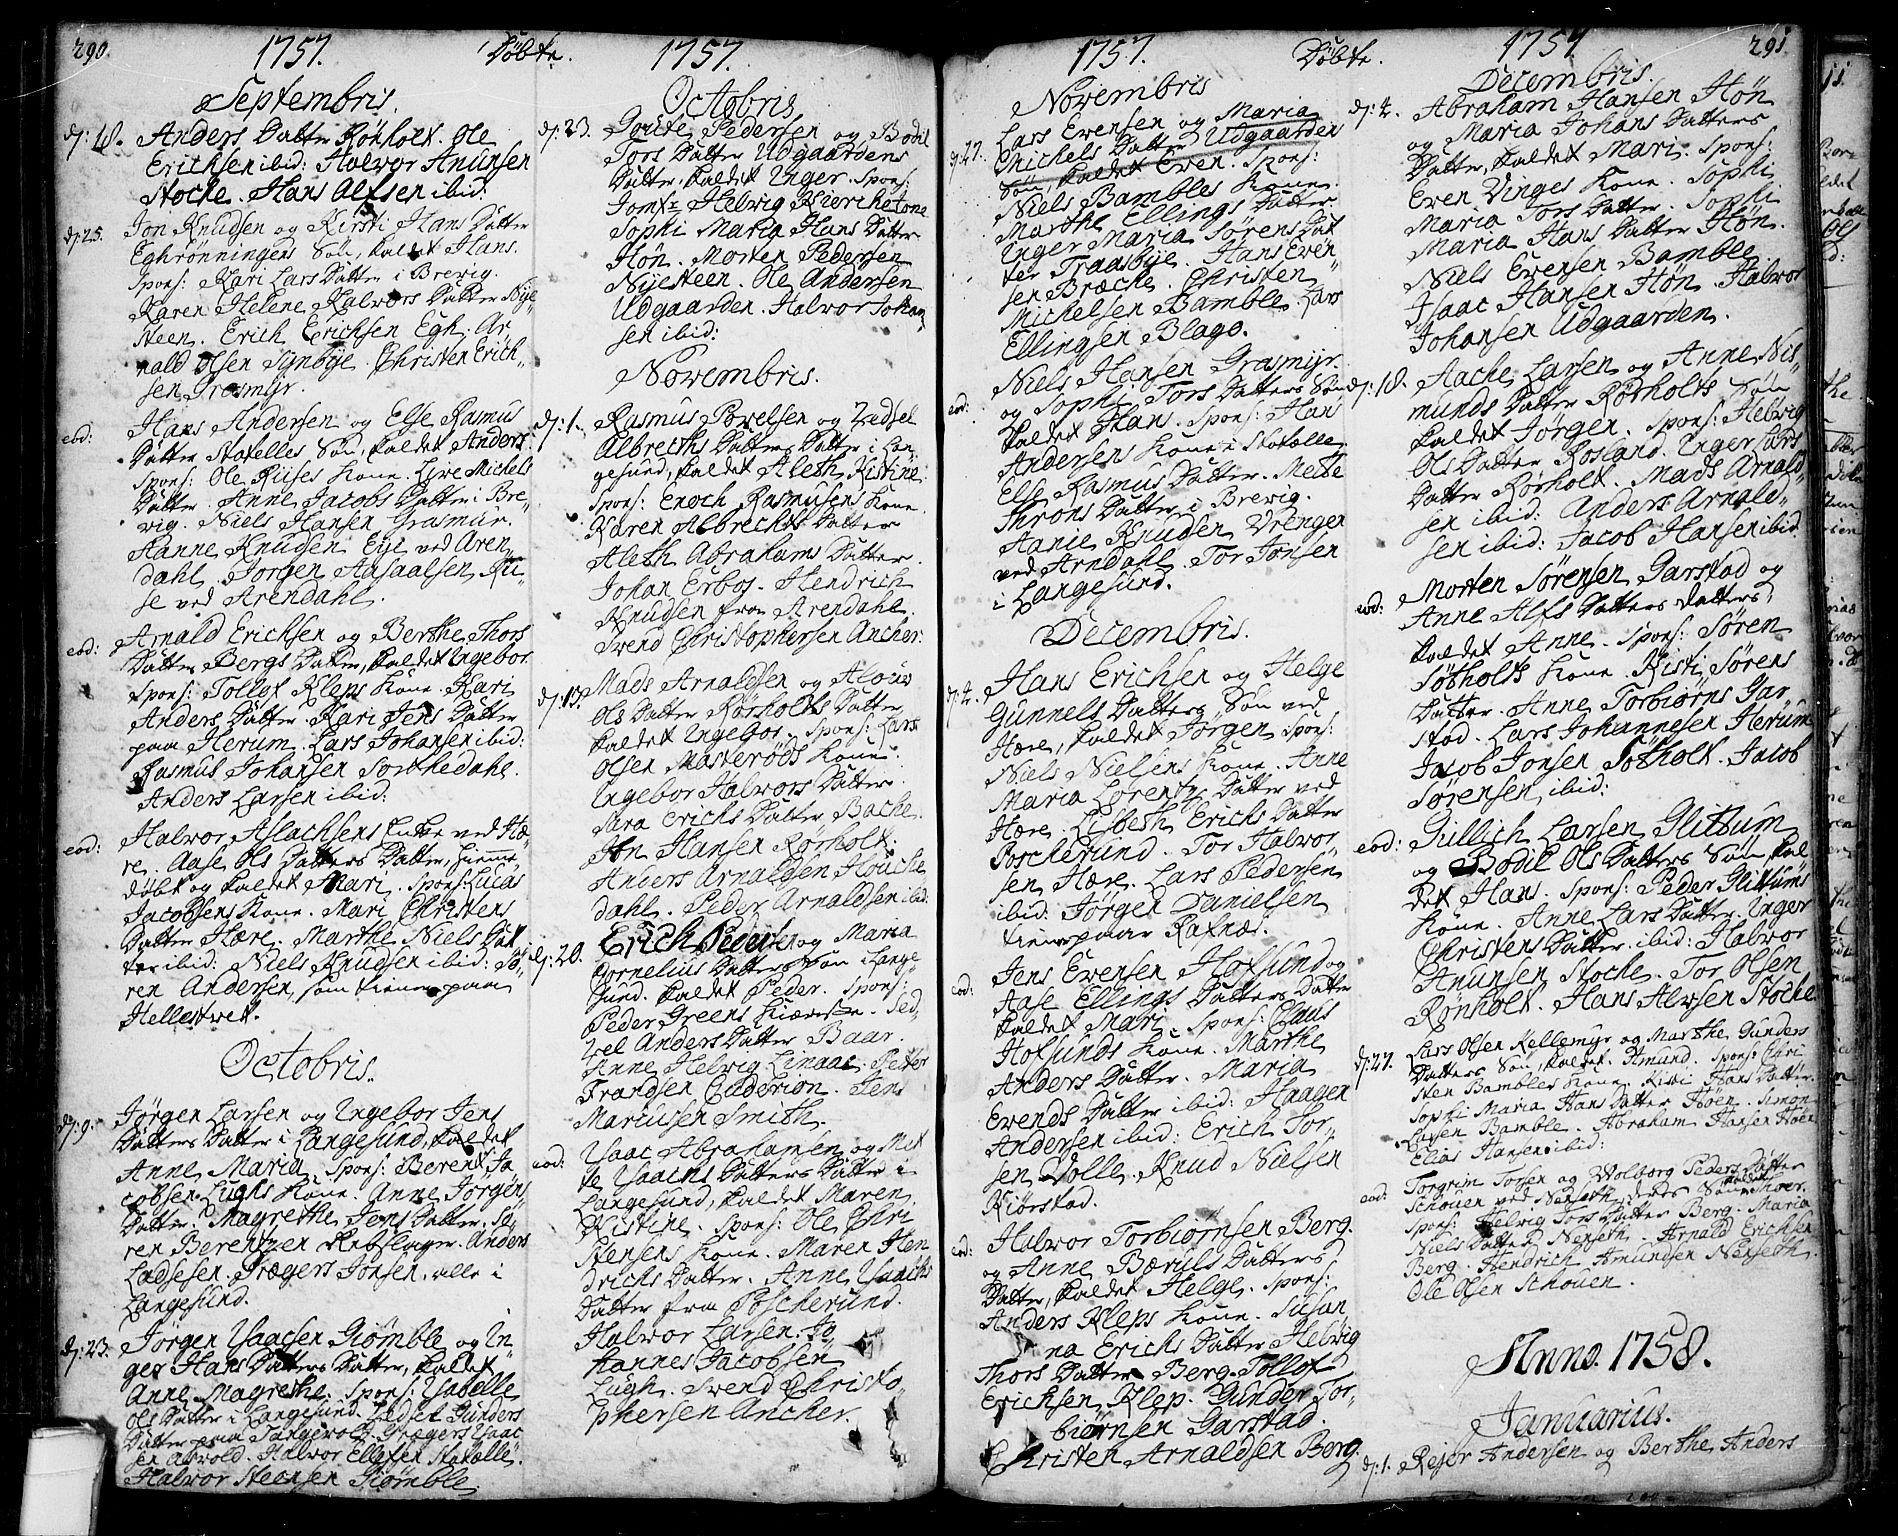 SAKO, Bamble kirkebøker, F/Fa/L0001: Ministerialbok nr. I 1, 1702-1774, s. 290-291